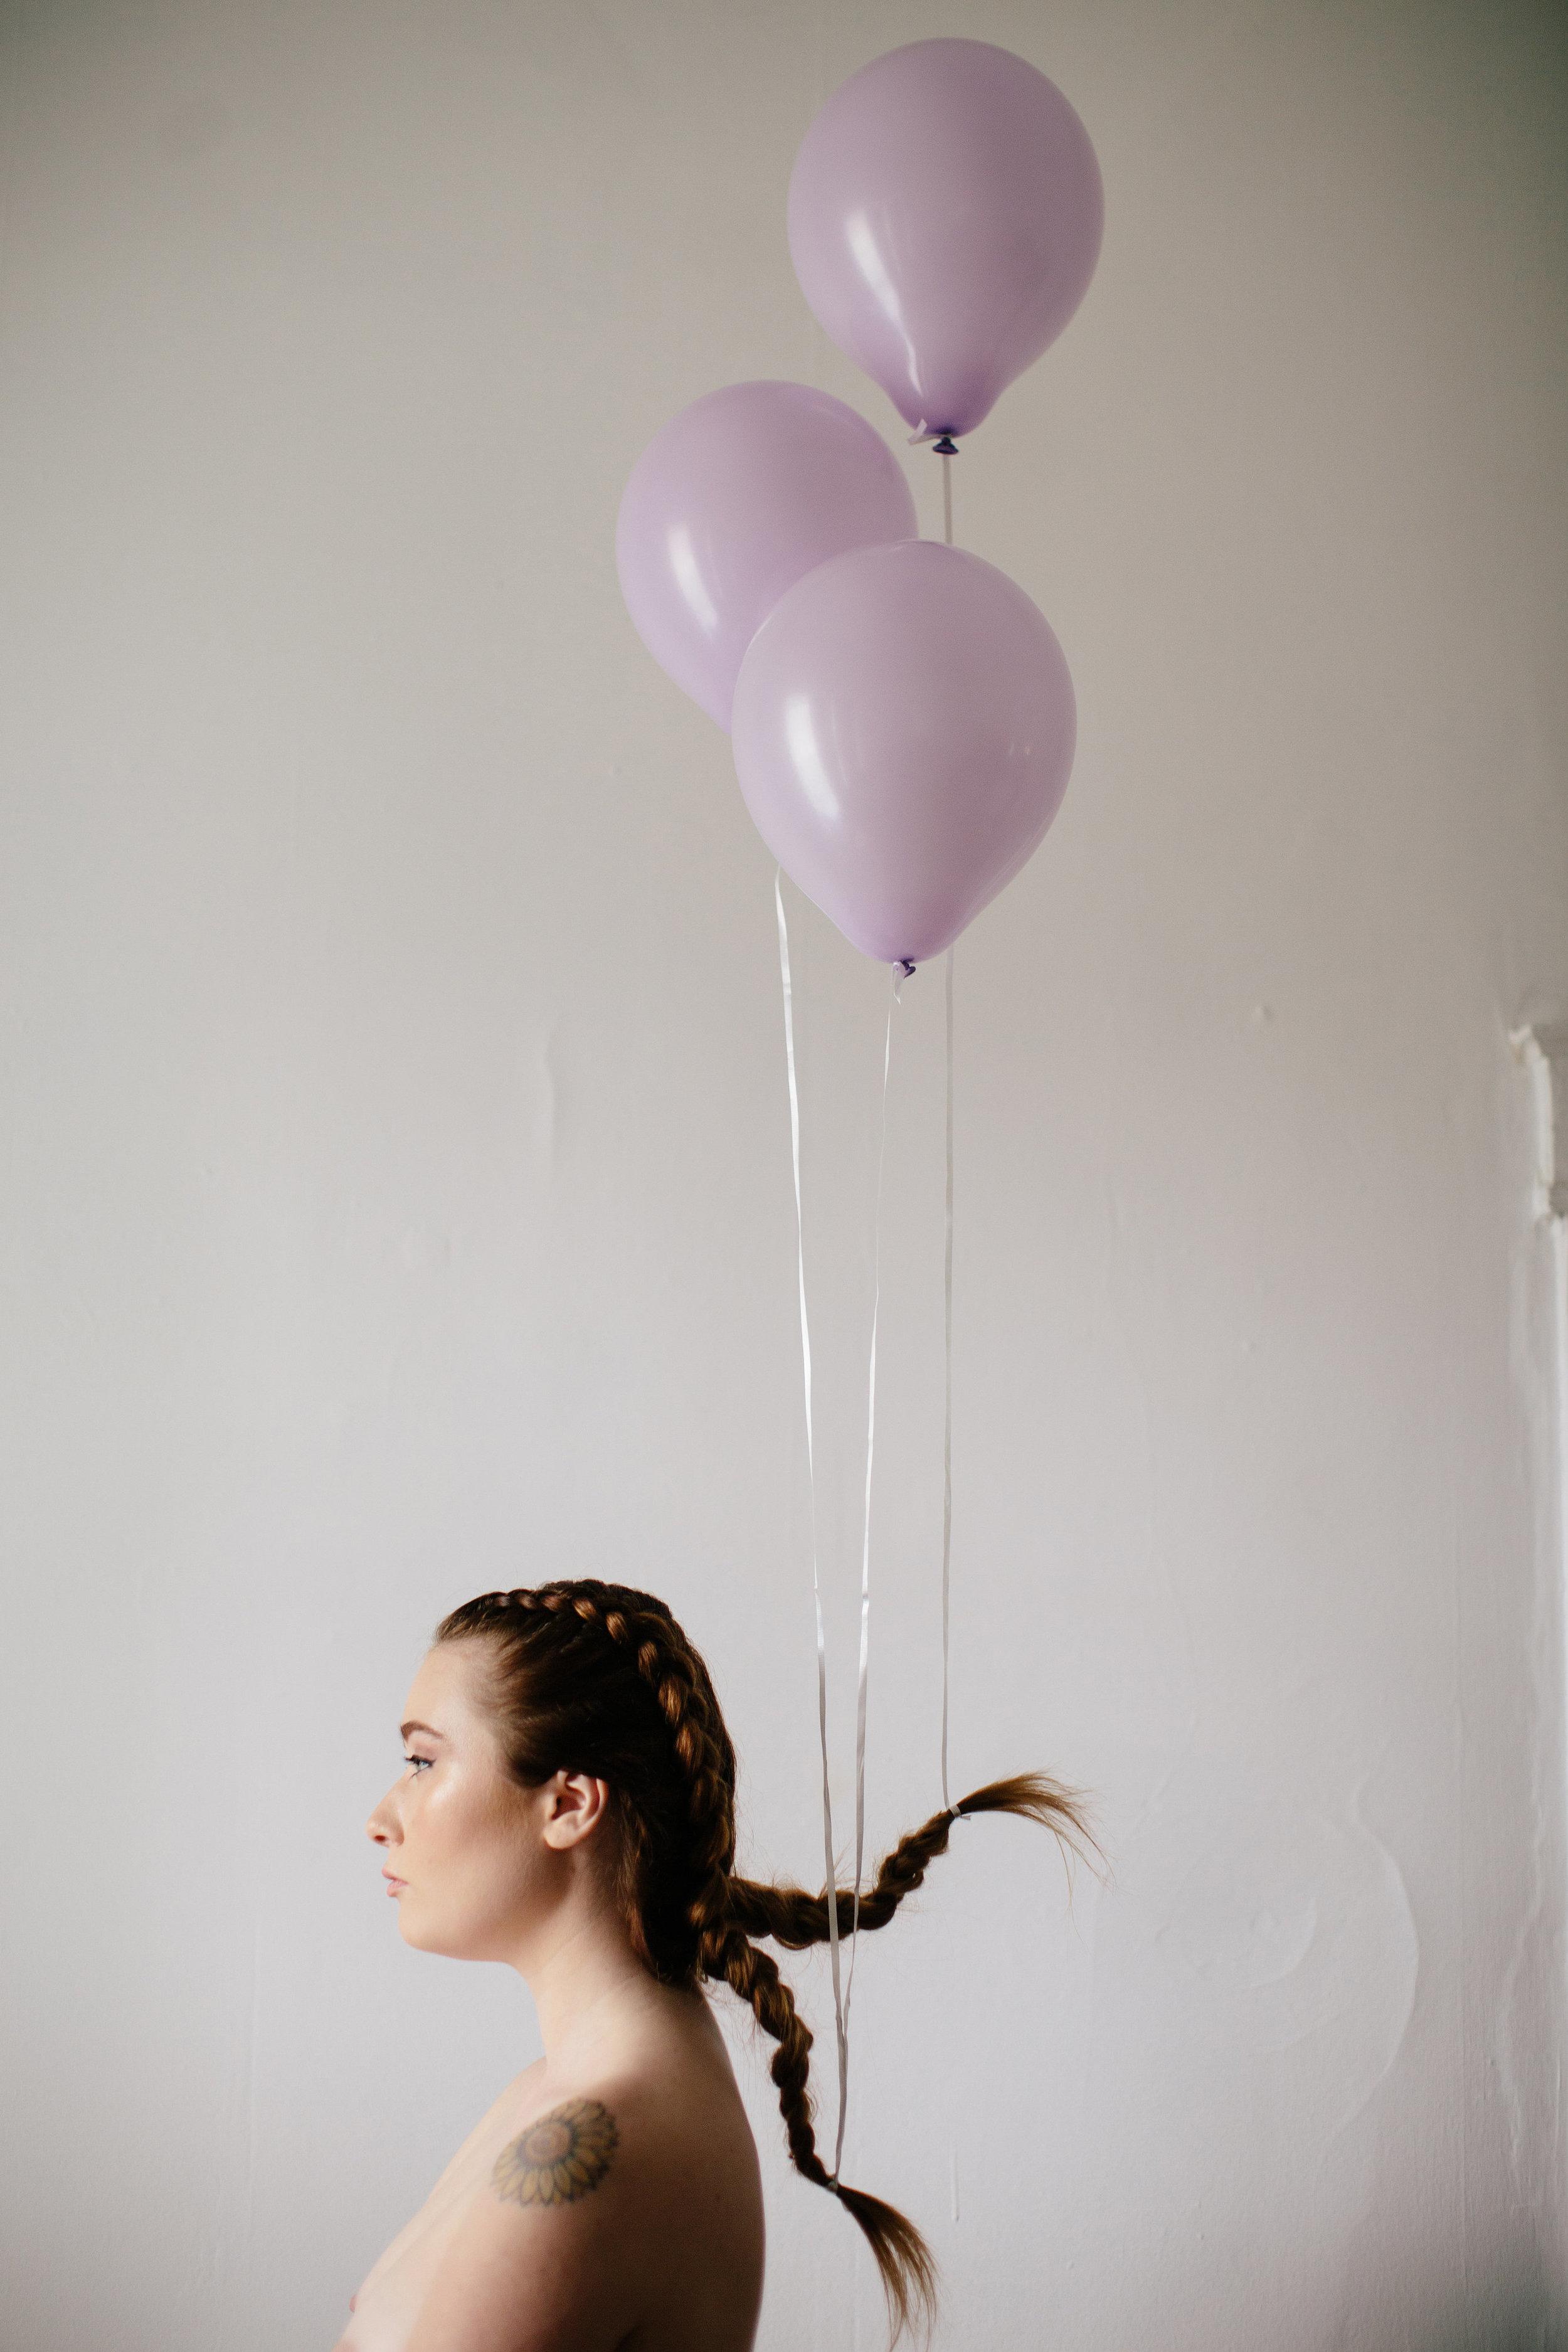 Jessica Cady by Bri Morse